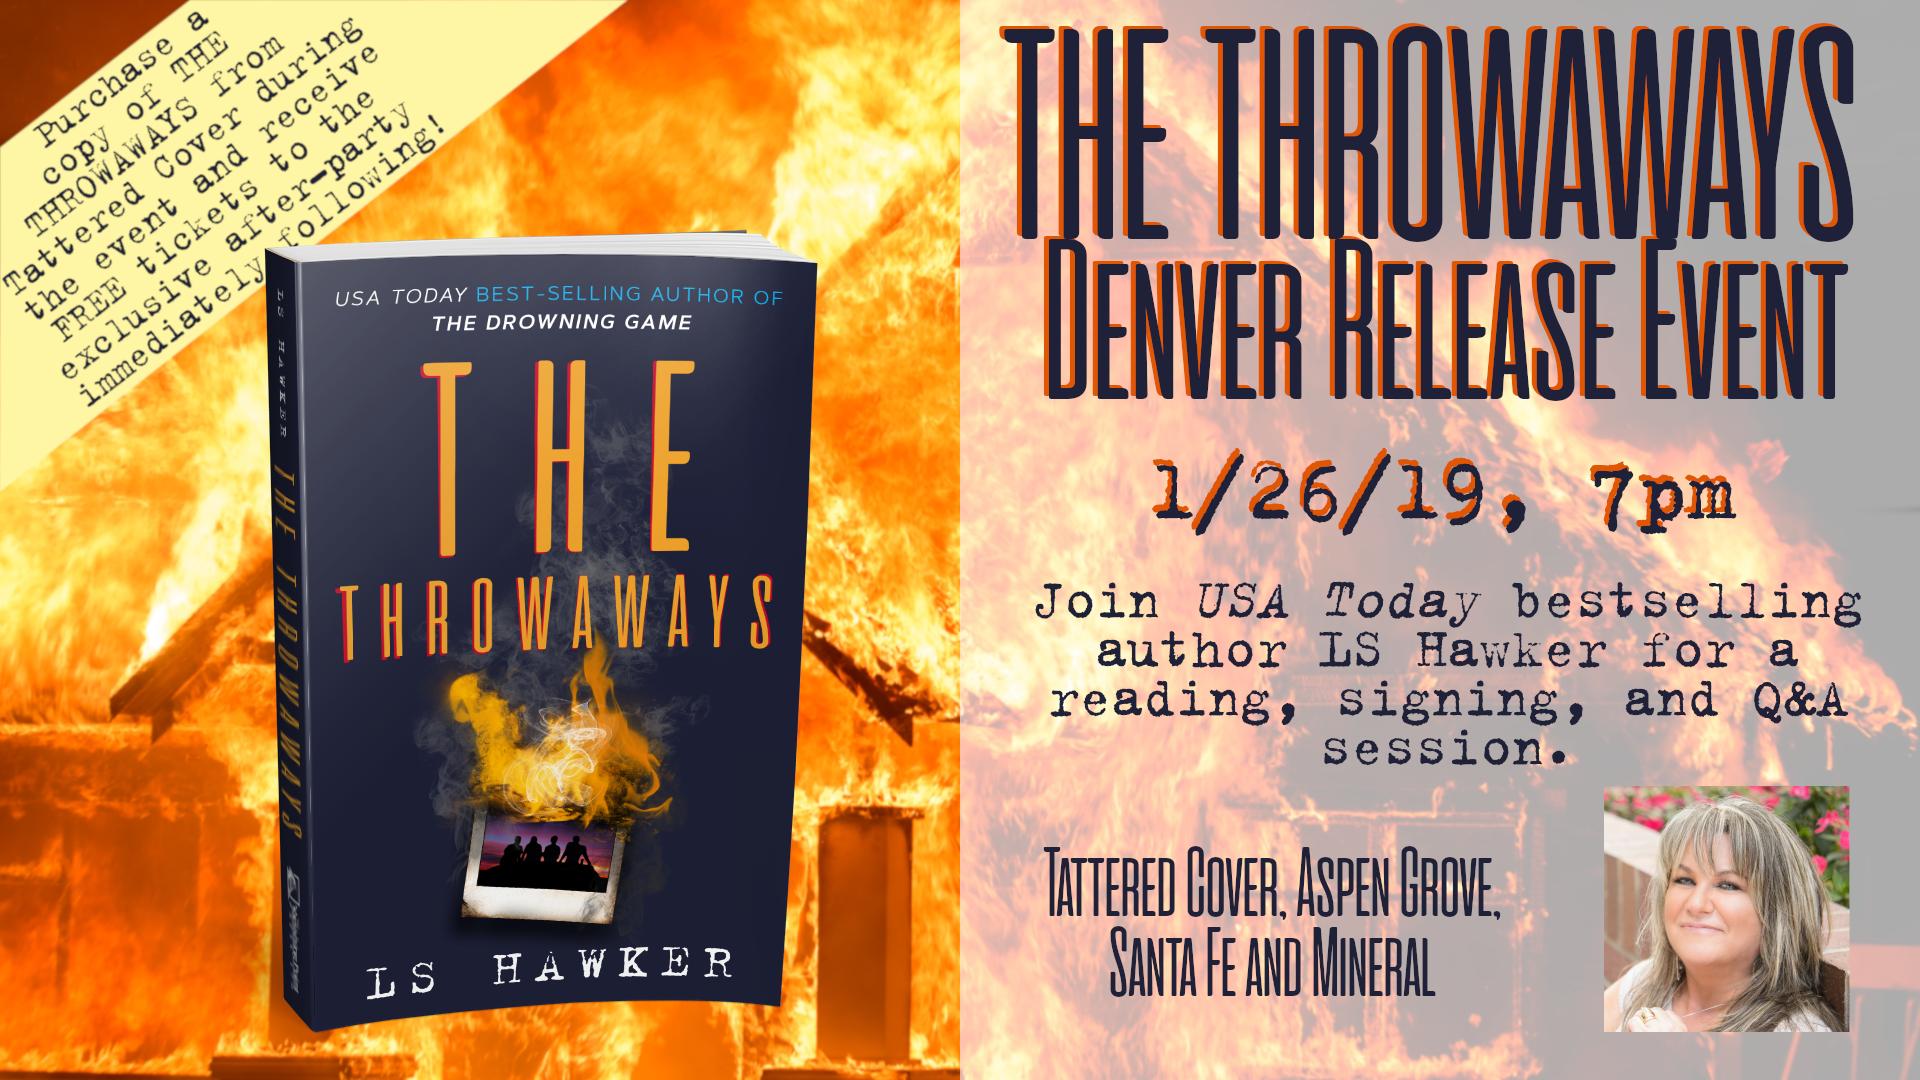 THE THROWAWAYS Denver Release Event